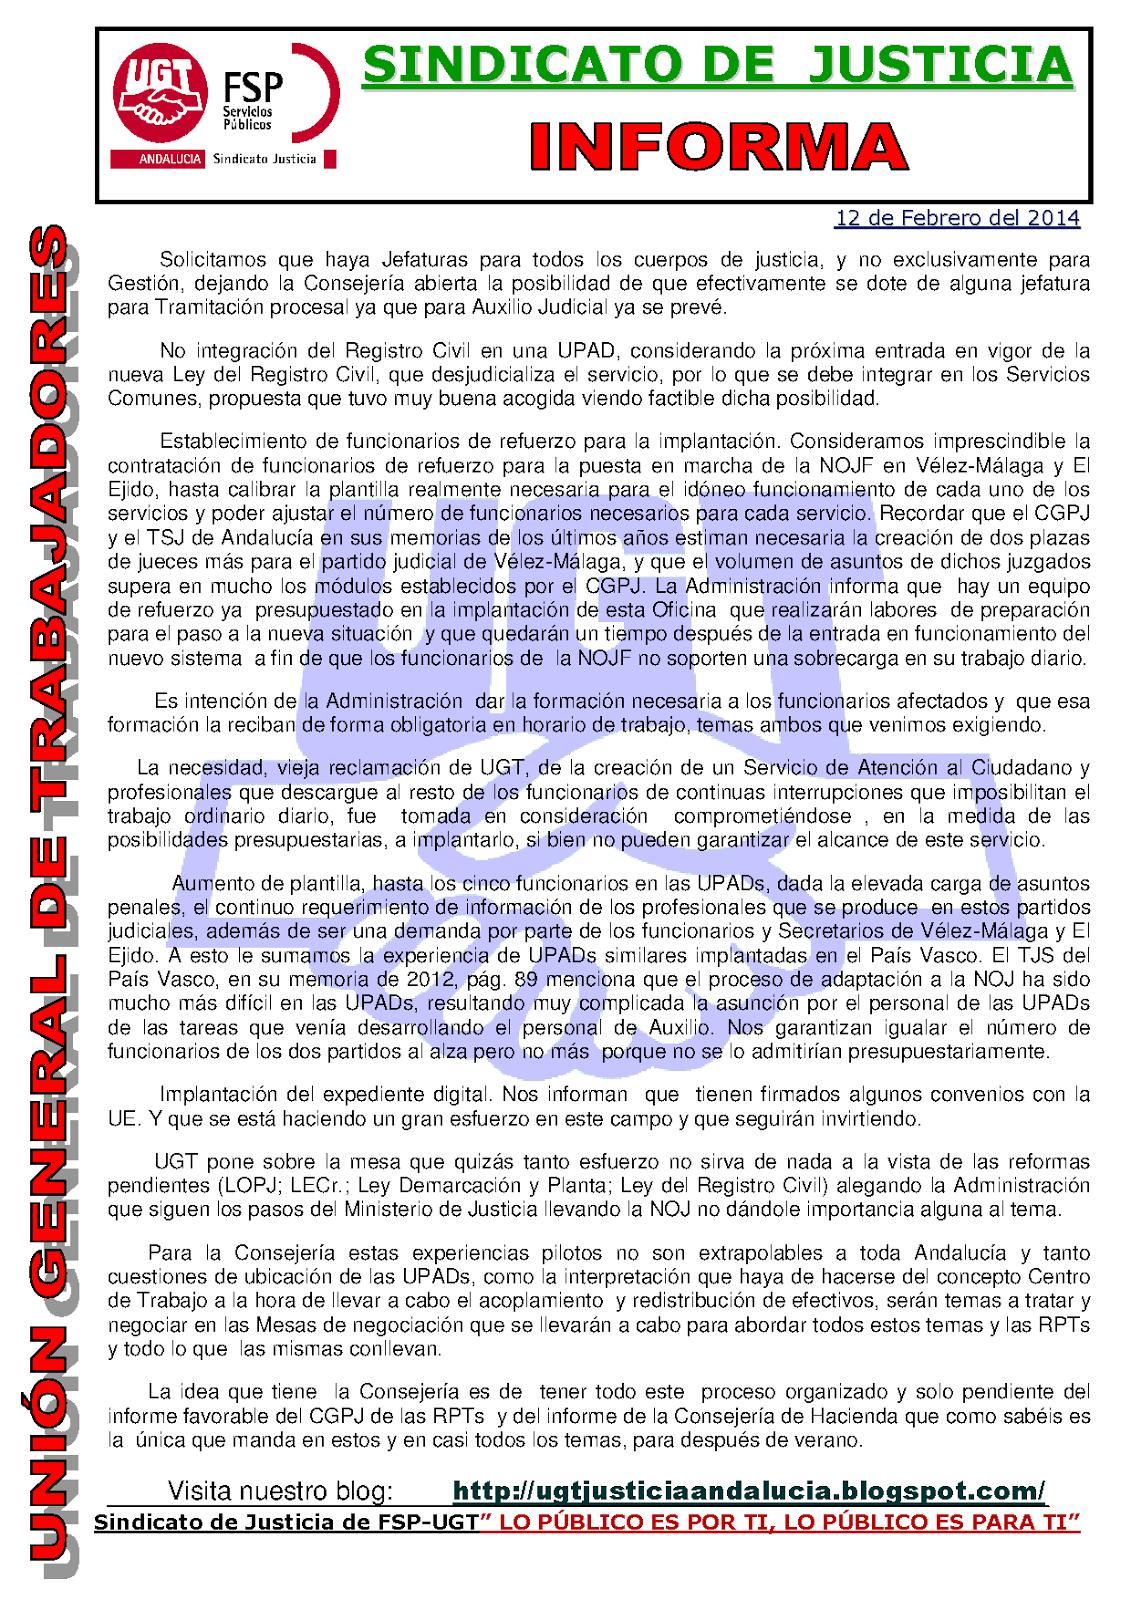 Sindicato de justicia fsp ugt andaluc a nueva oficina for Oficina de empleo velez malaga